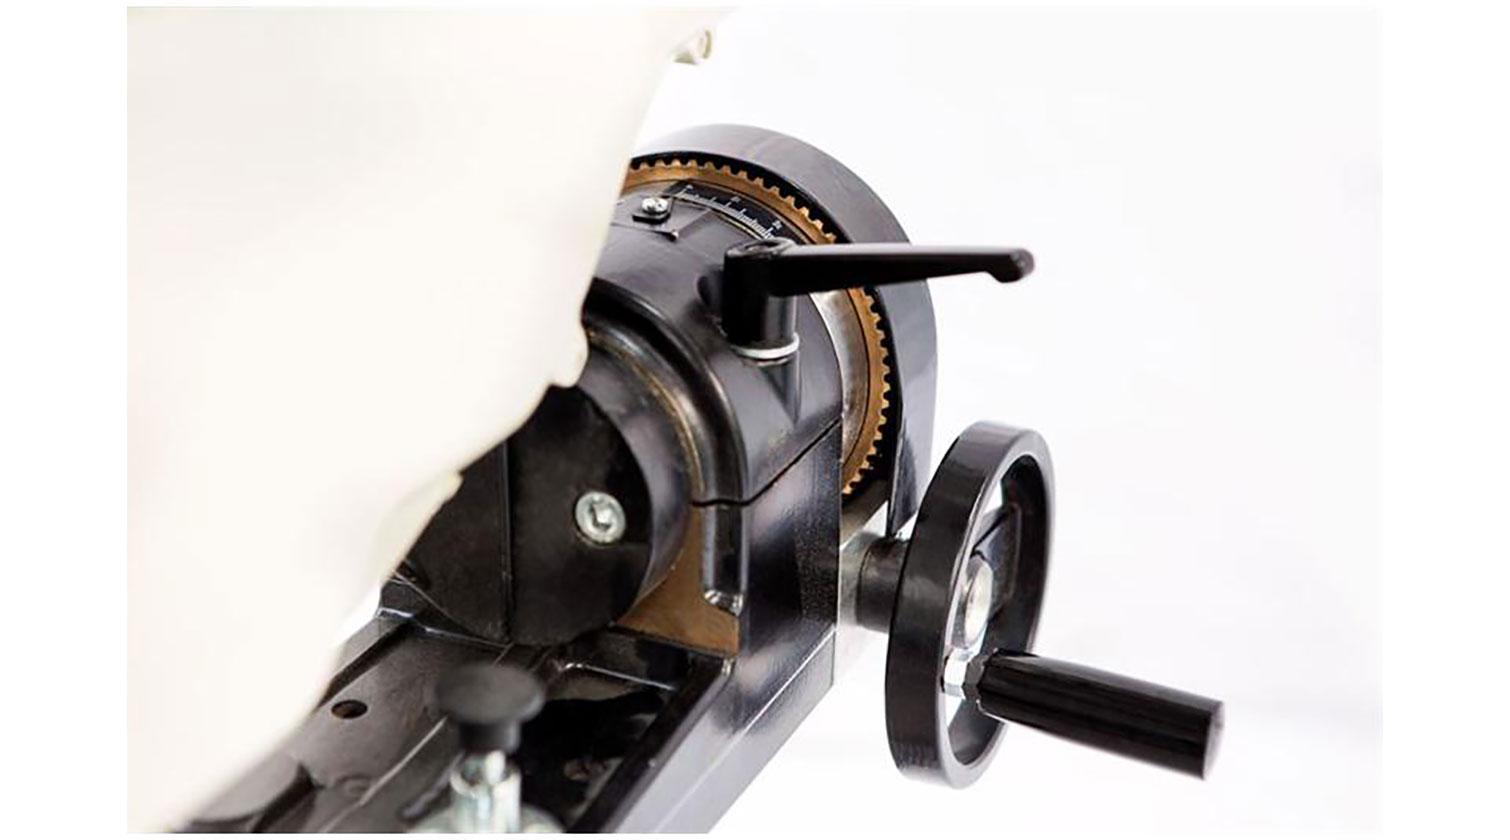 INT aluminum radial arm compound saw Yilmaz RYK 420 tilting mechanism